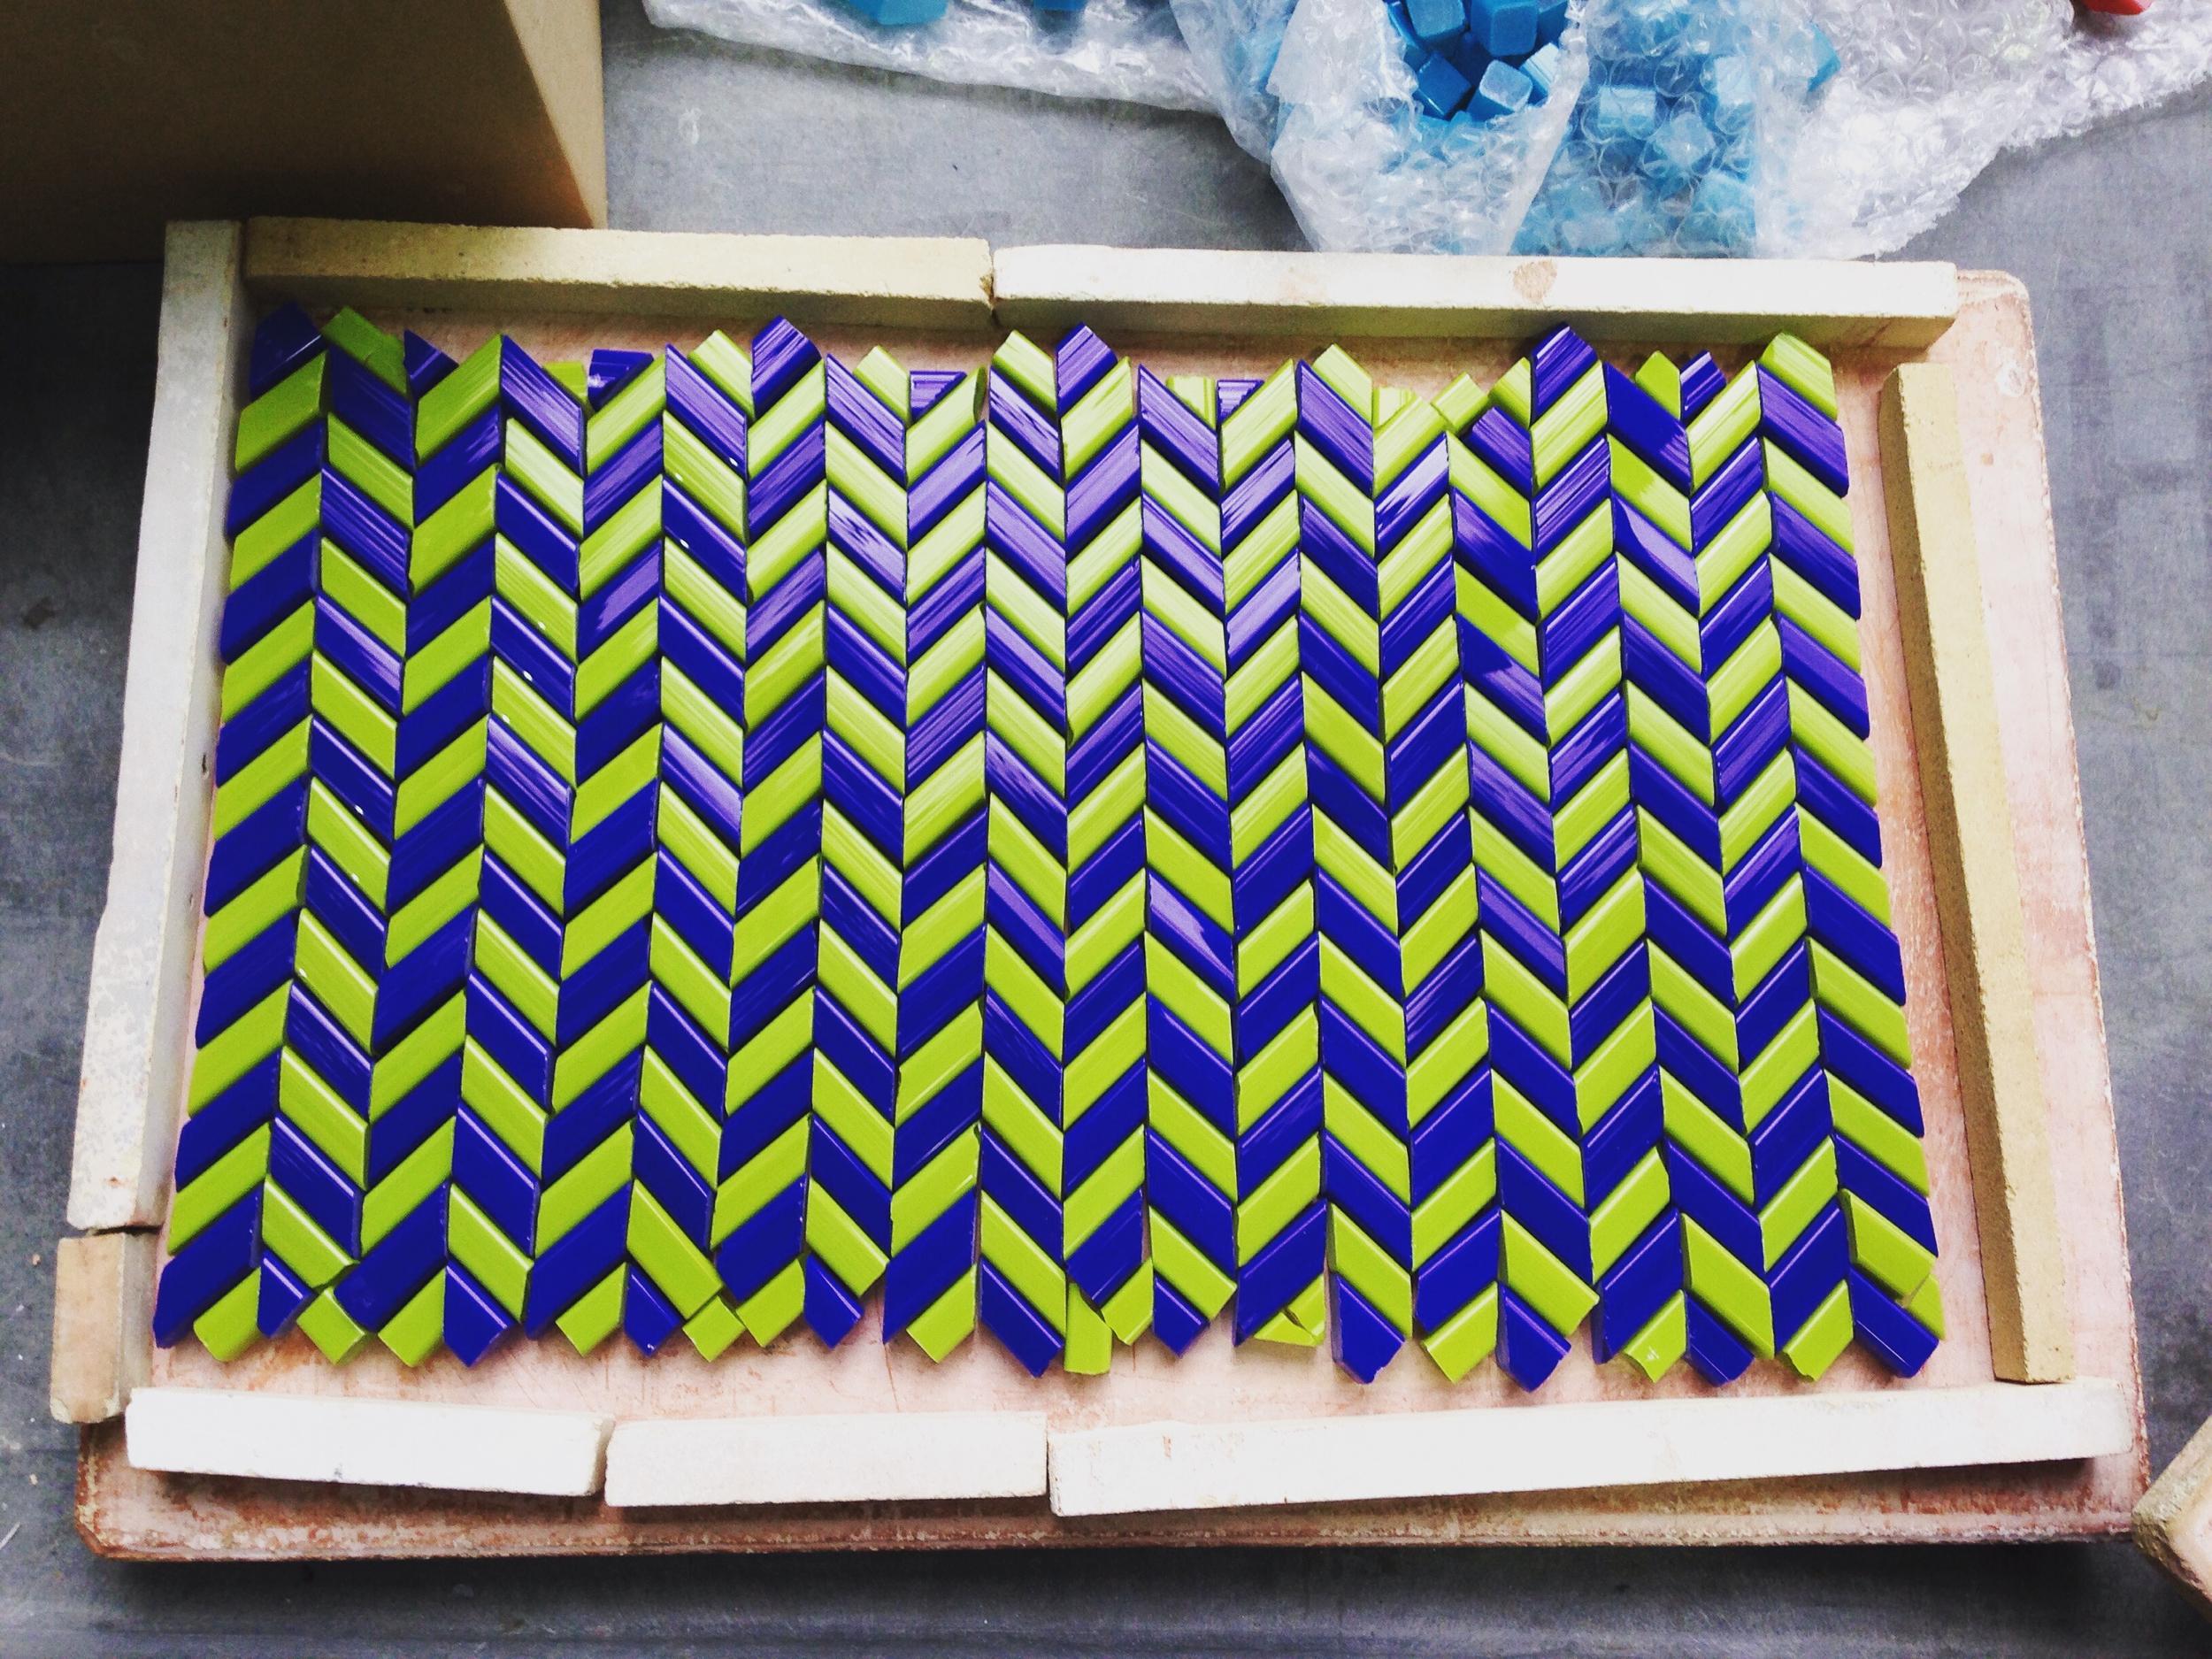 Weave mosaic